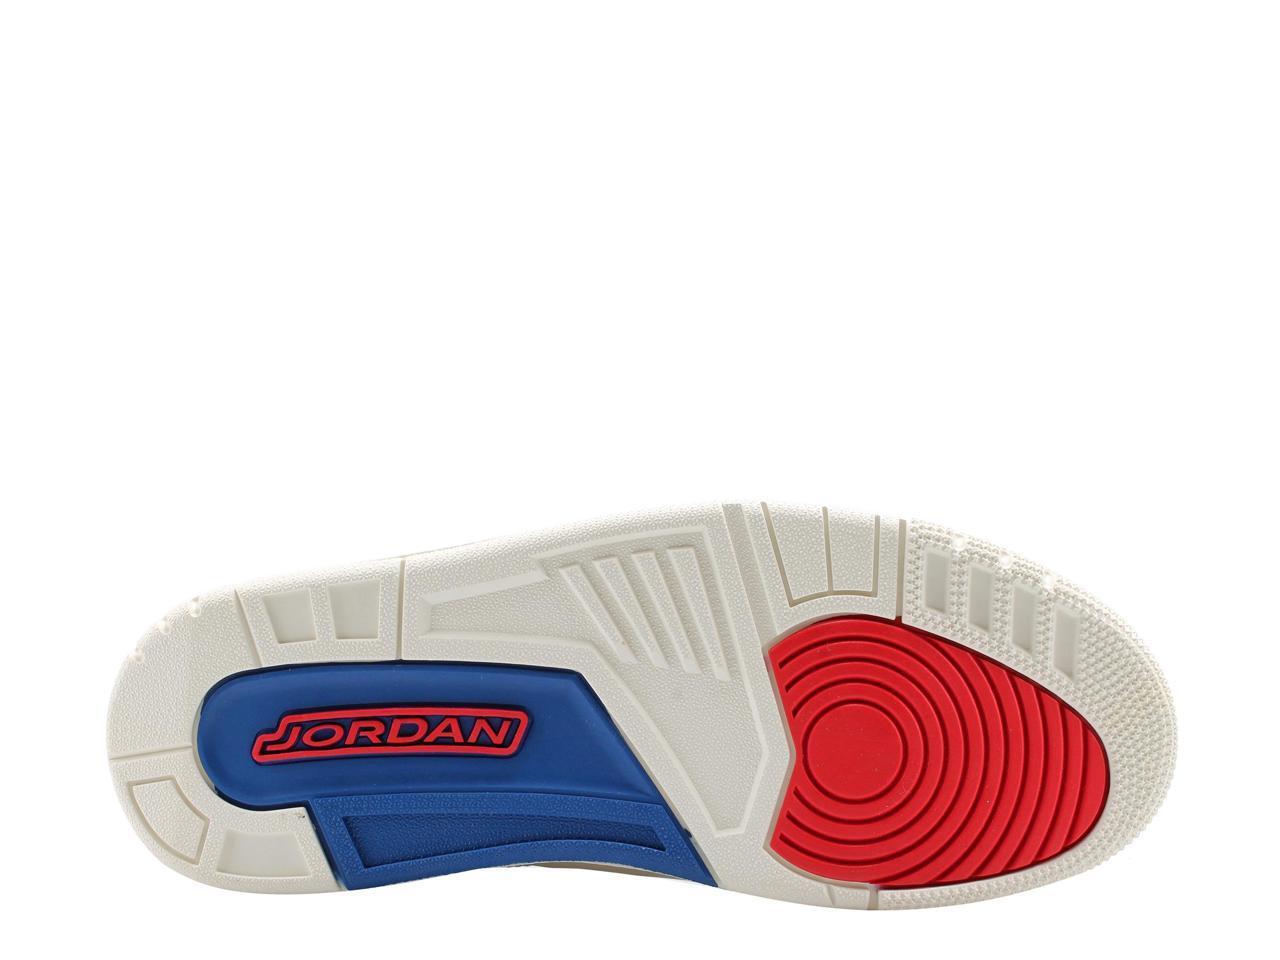 nike air jordan 3 3 jordan rétro international sail hommes & # 39; s de basket - ball 136064-116 taille 11 bc487e